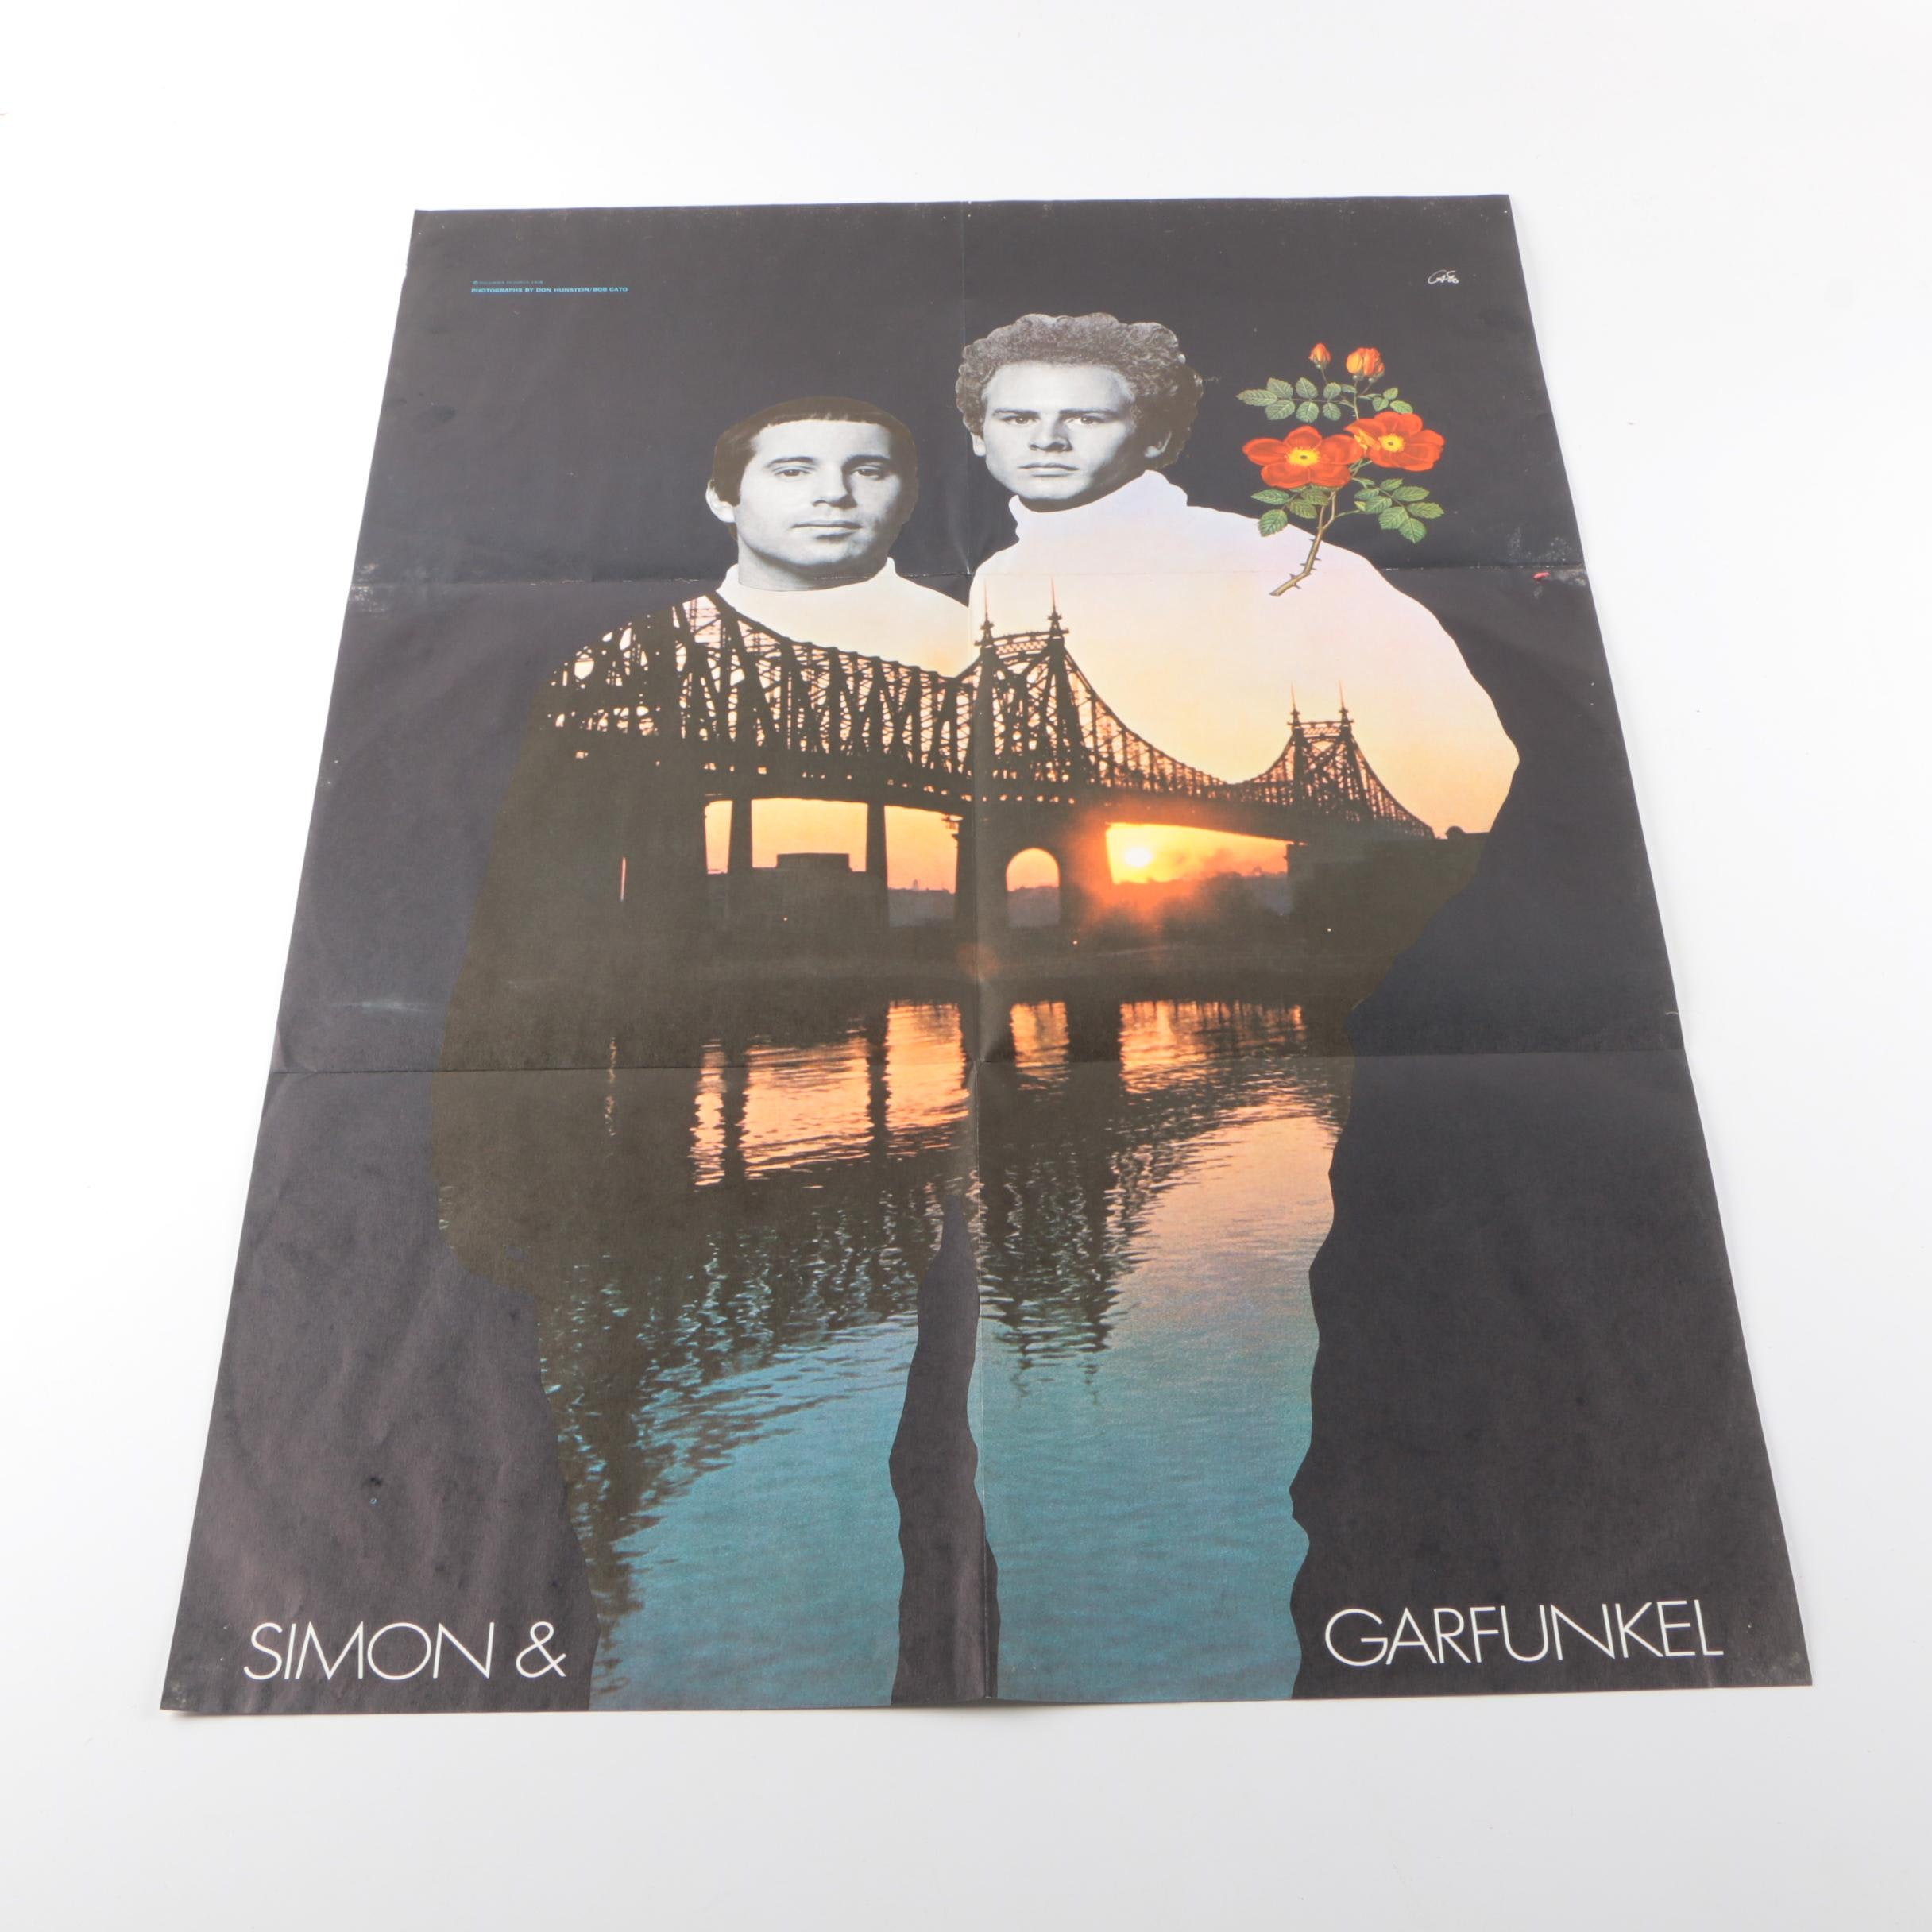 Simon and Garfunkel Lithograph Poster